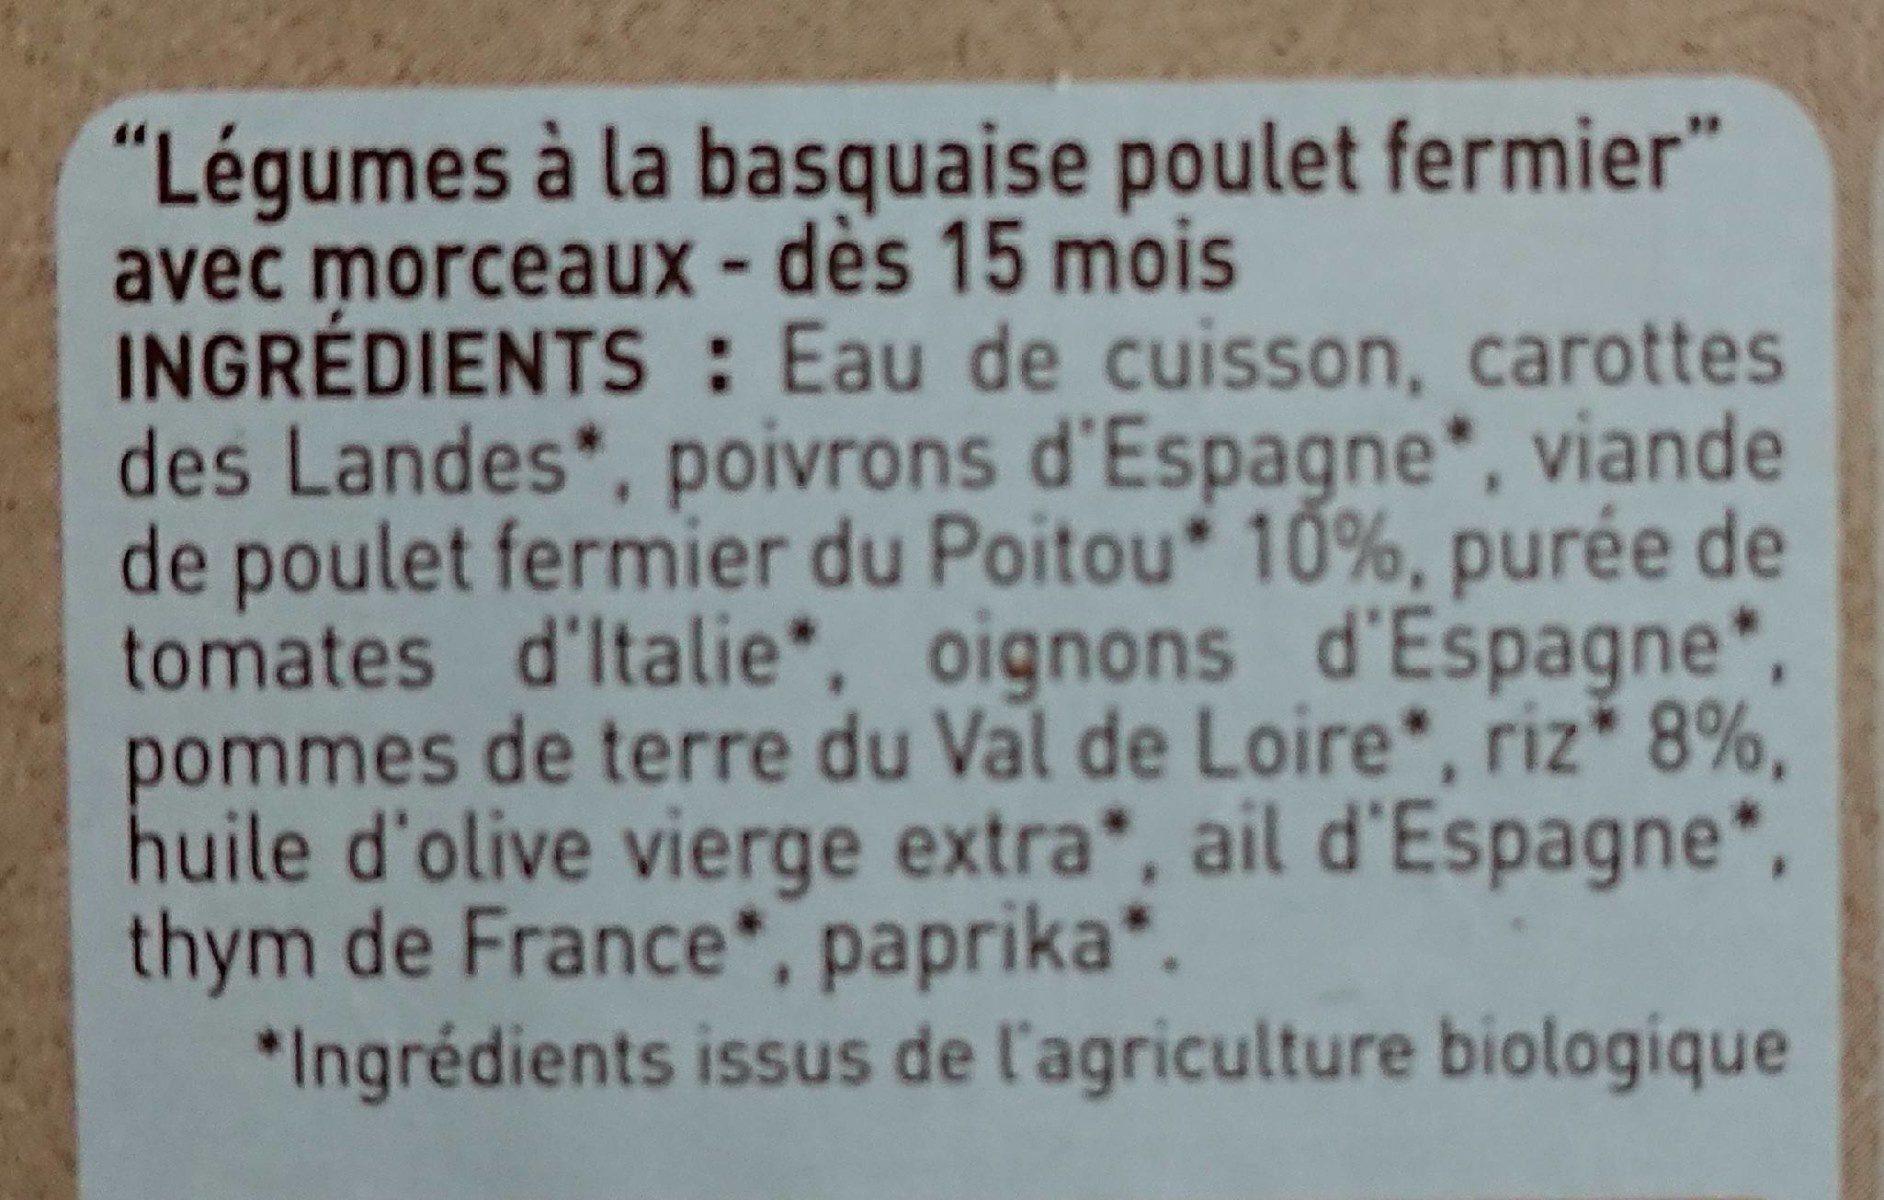 Légumes à la basquaise & poulet fermier - Ingrediënten